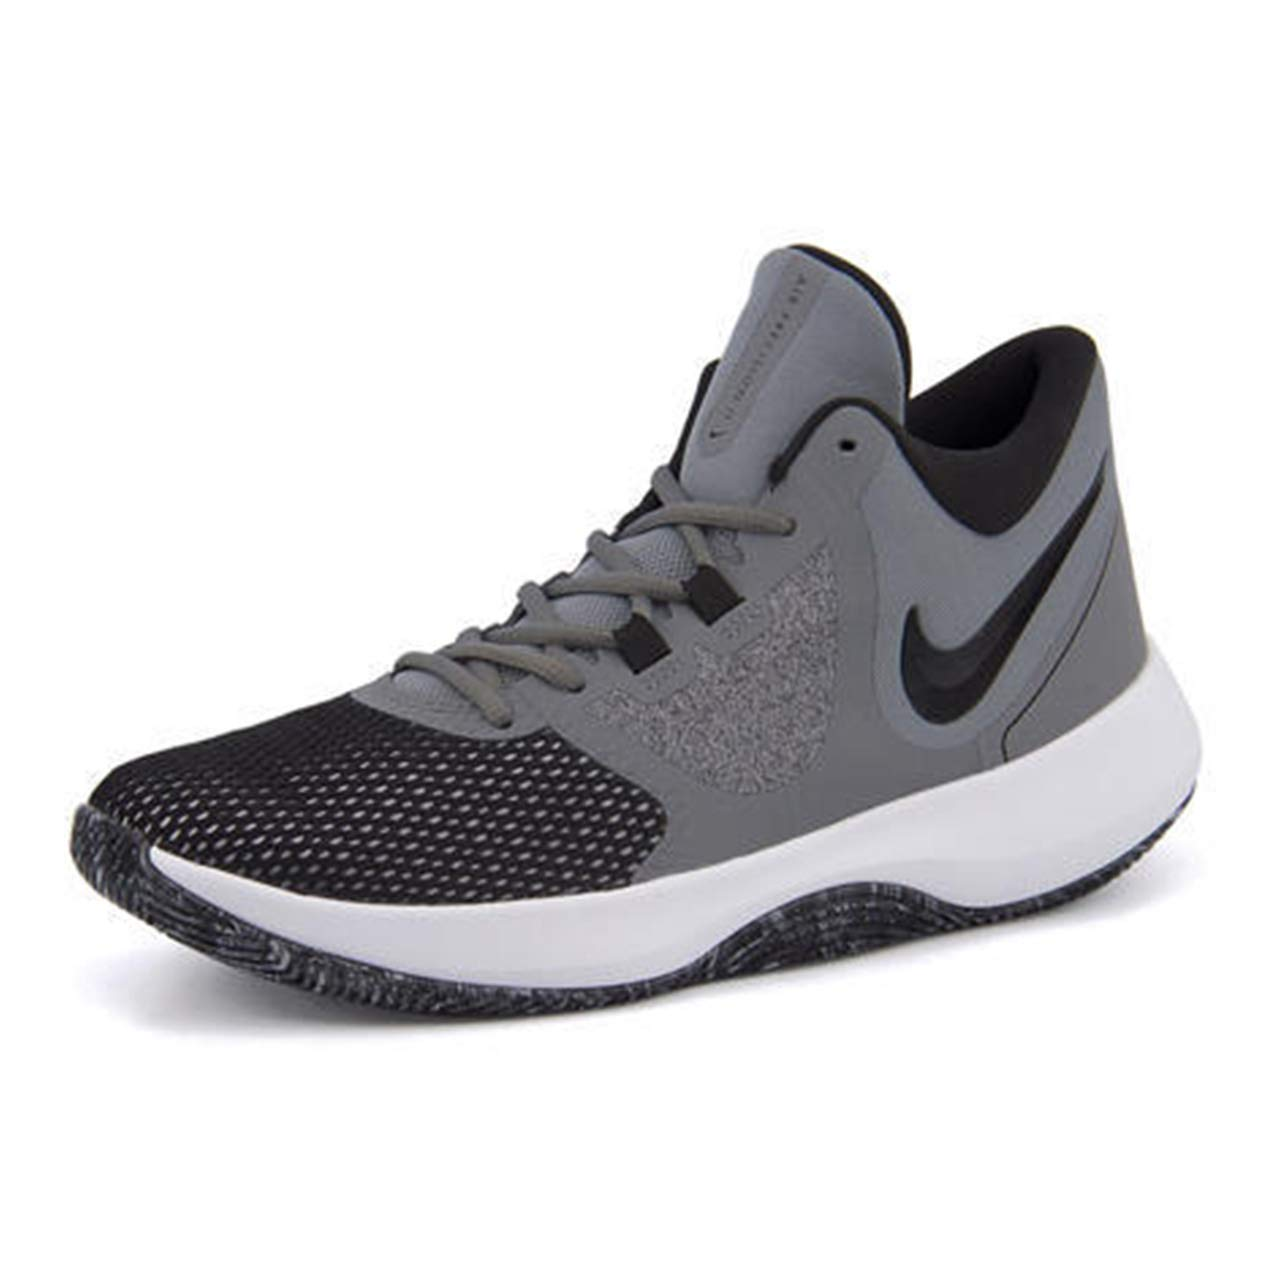 Buy Nike Air Precision II Basketball